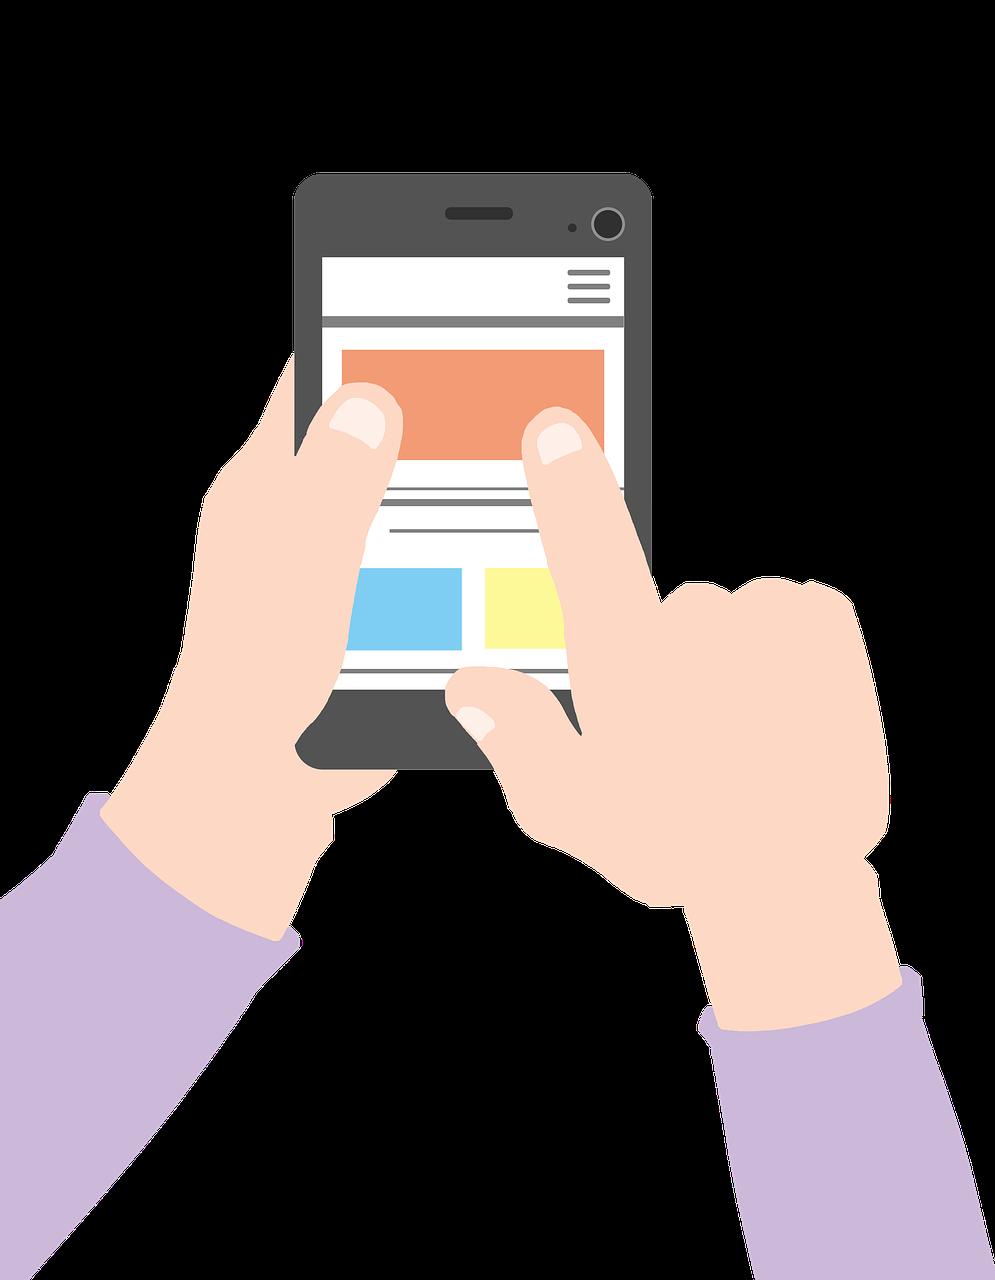 New Feature Release: Mobile App Widgets